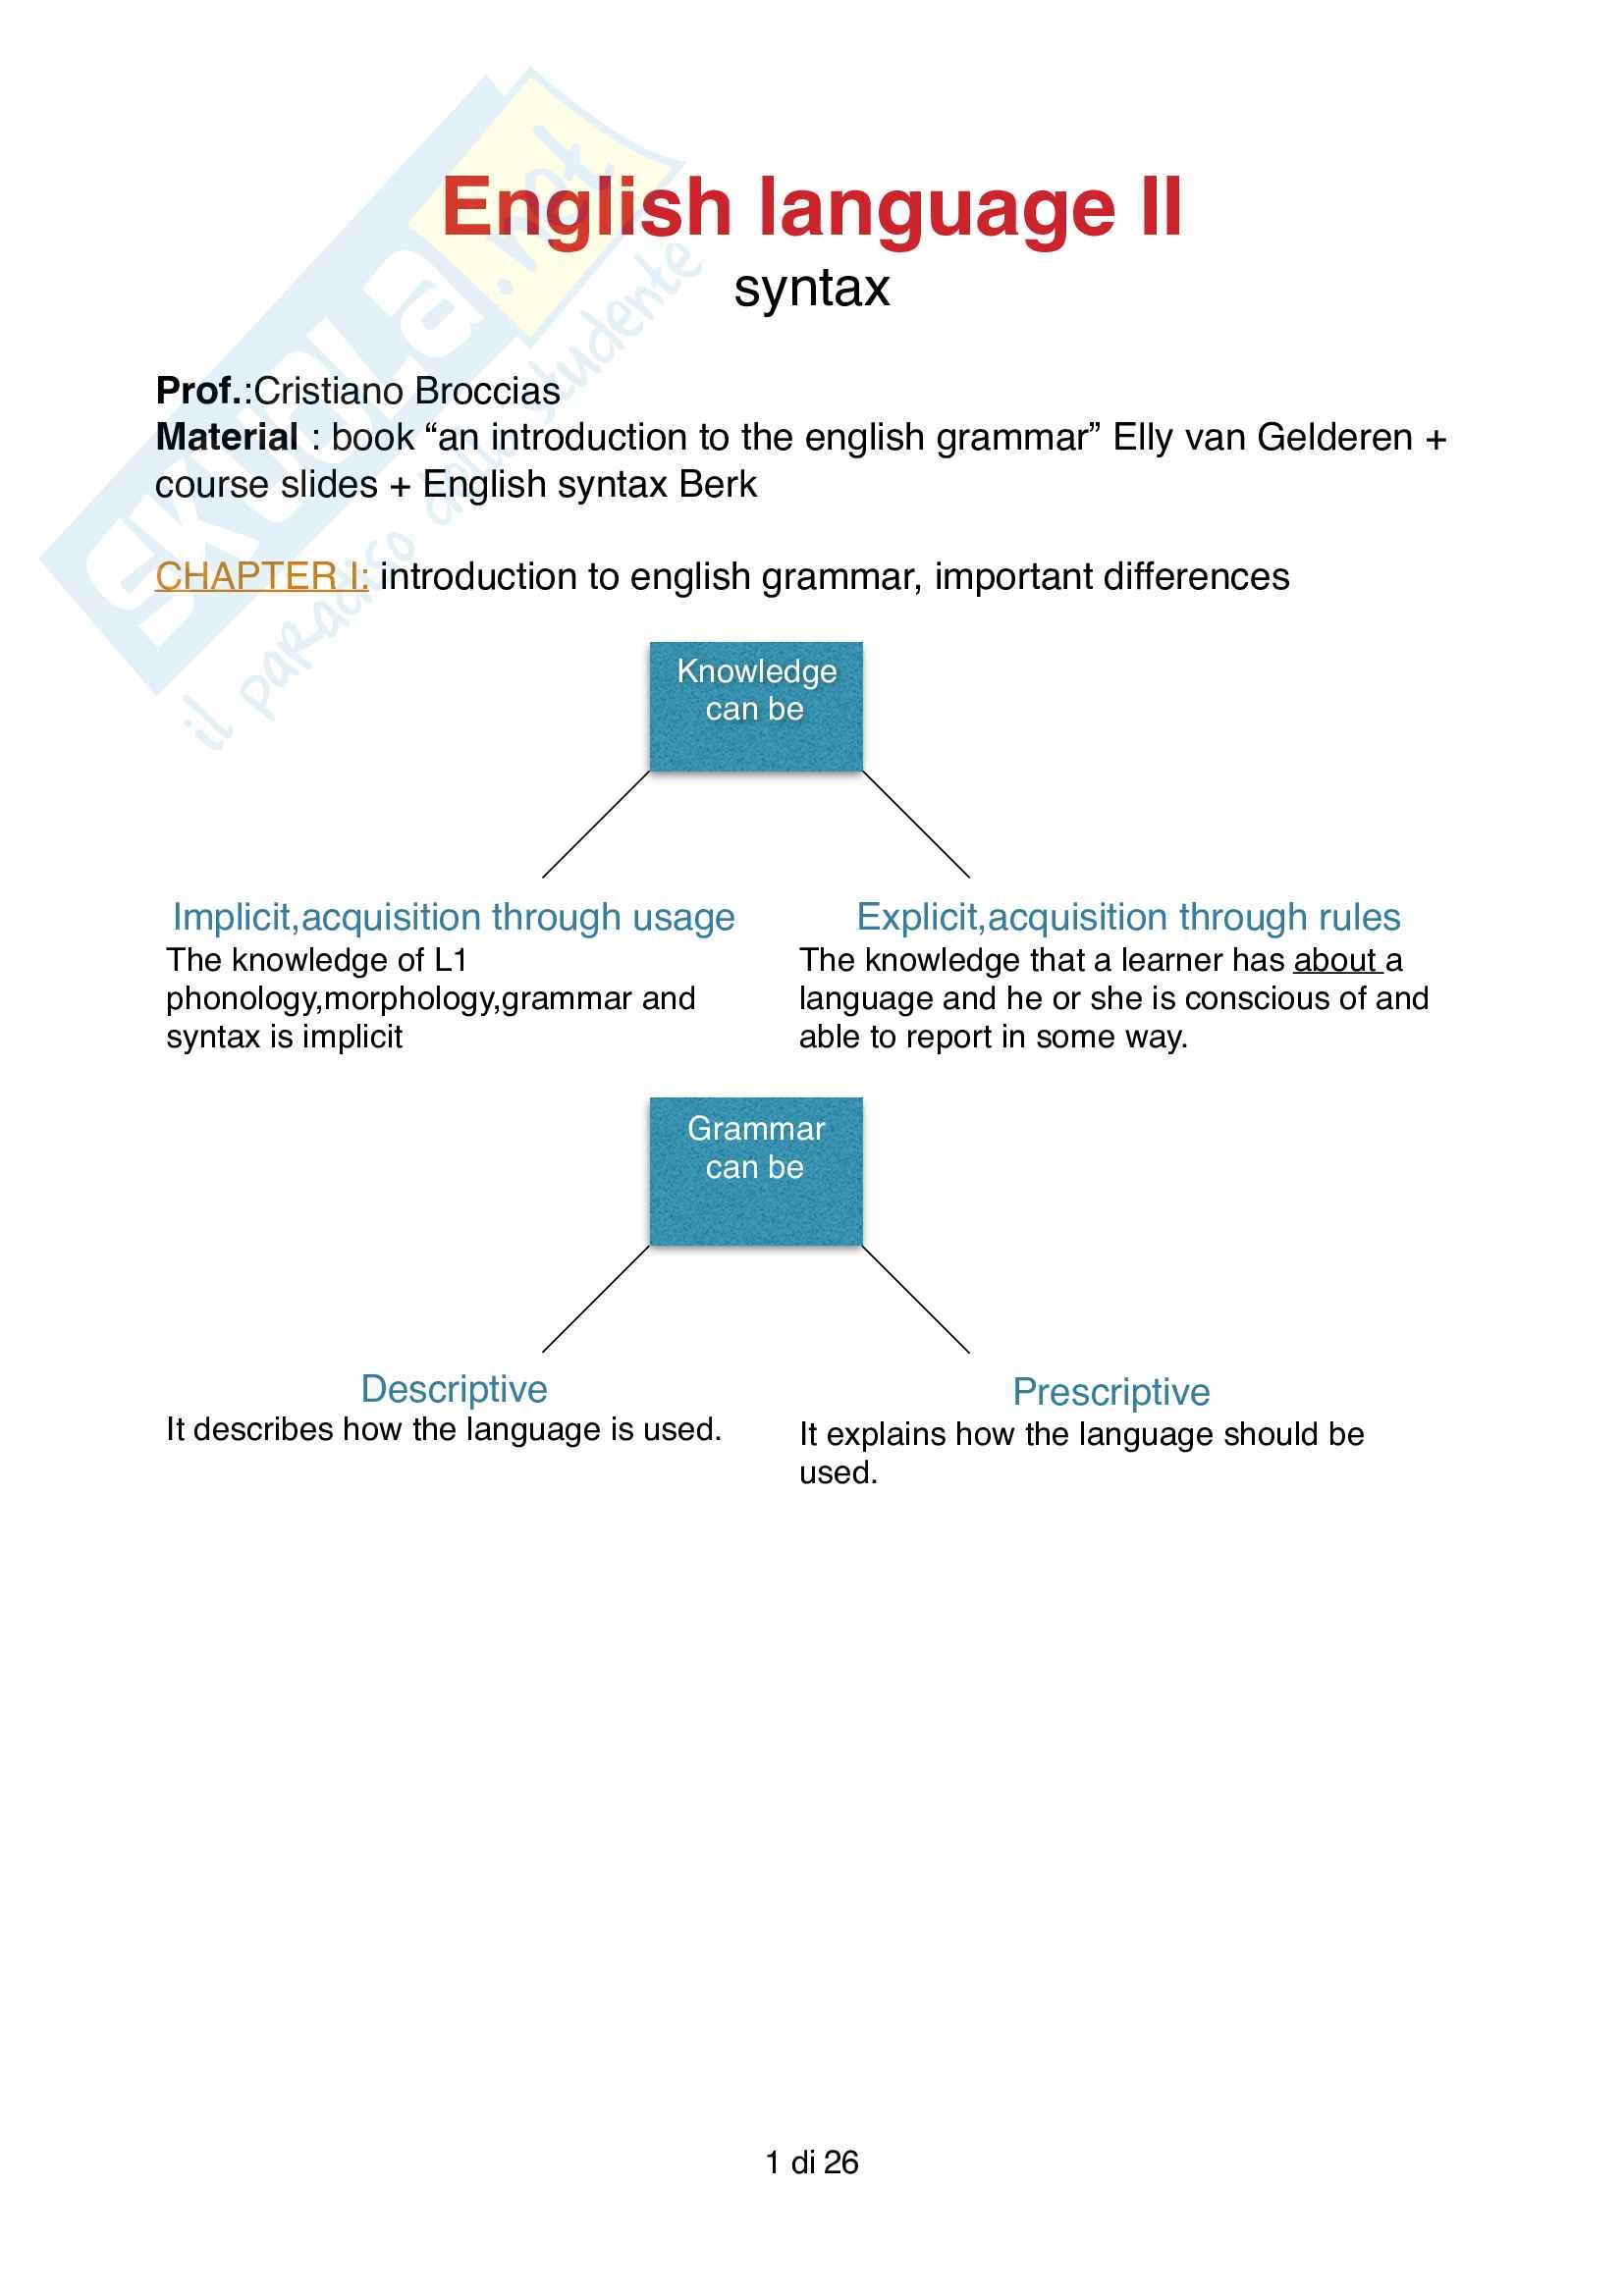 Modulo teorico inglese II - Sintassi Pag. 1